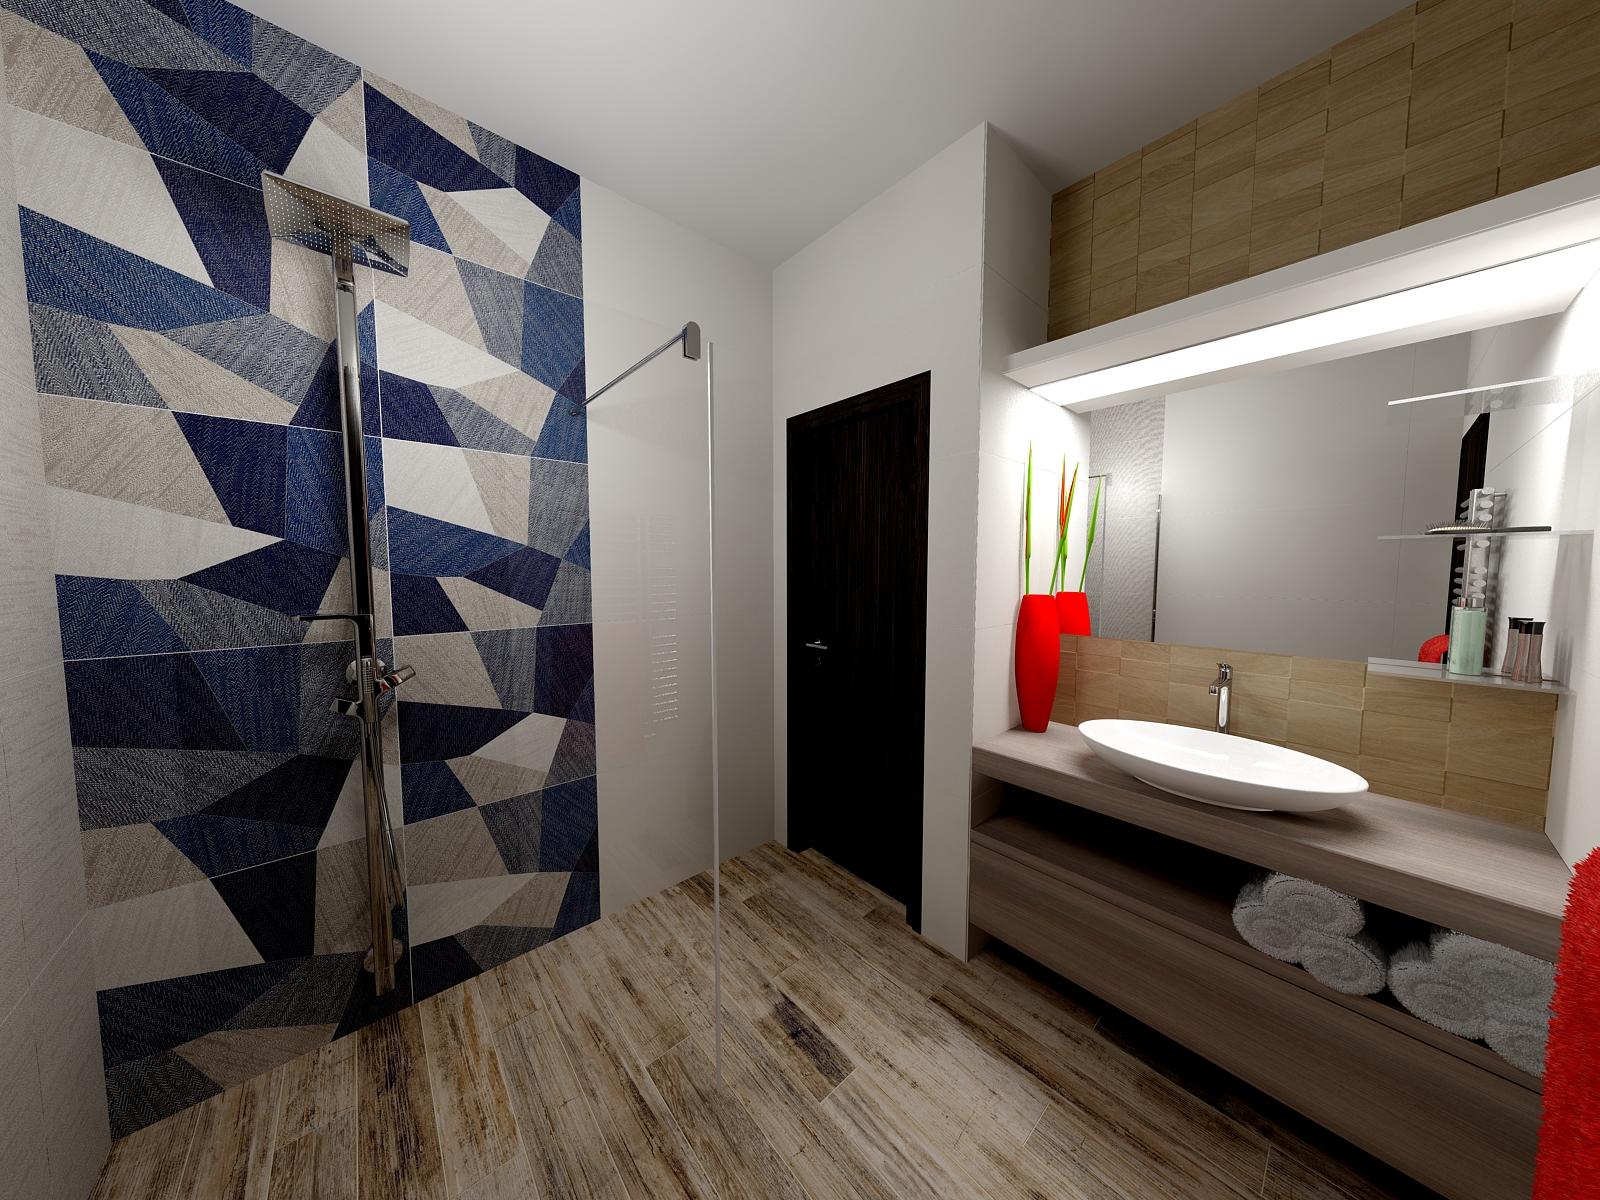 fa 1 bathroom by kerubina gsv kereskedelmi kft on visoft360 portal. Black Bedroom Furniture Sets. Home Design Ideas